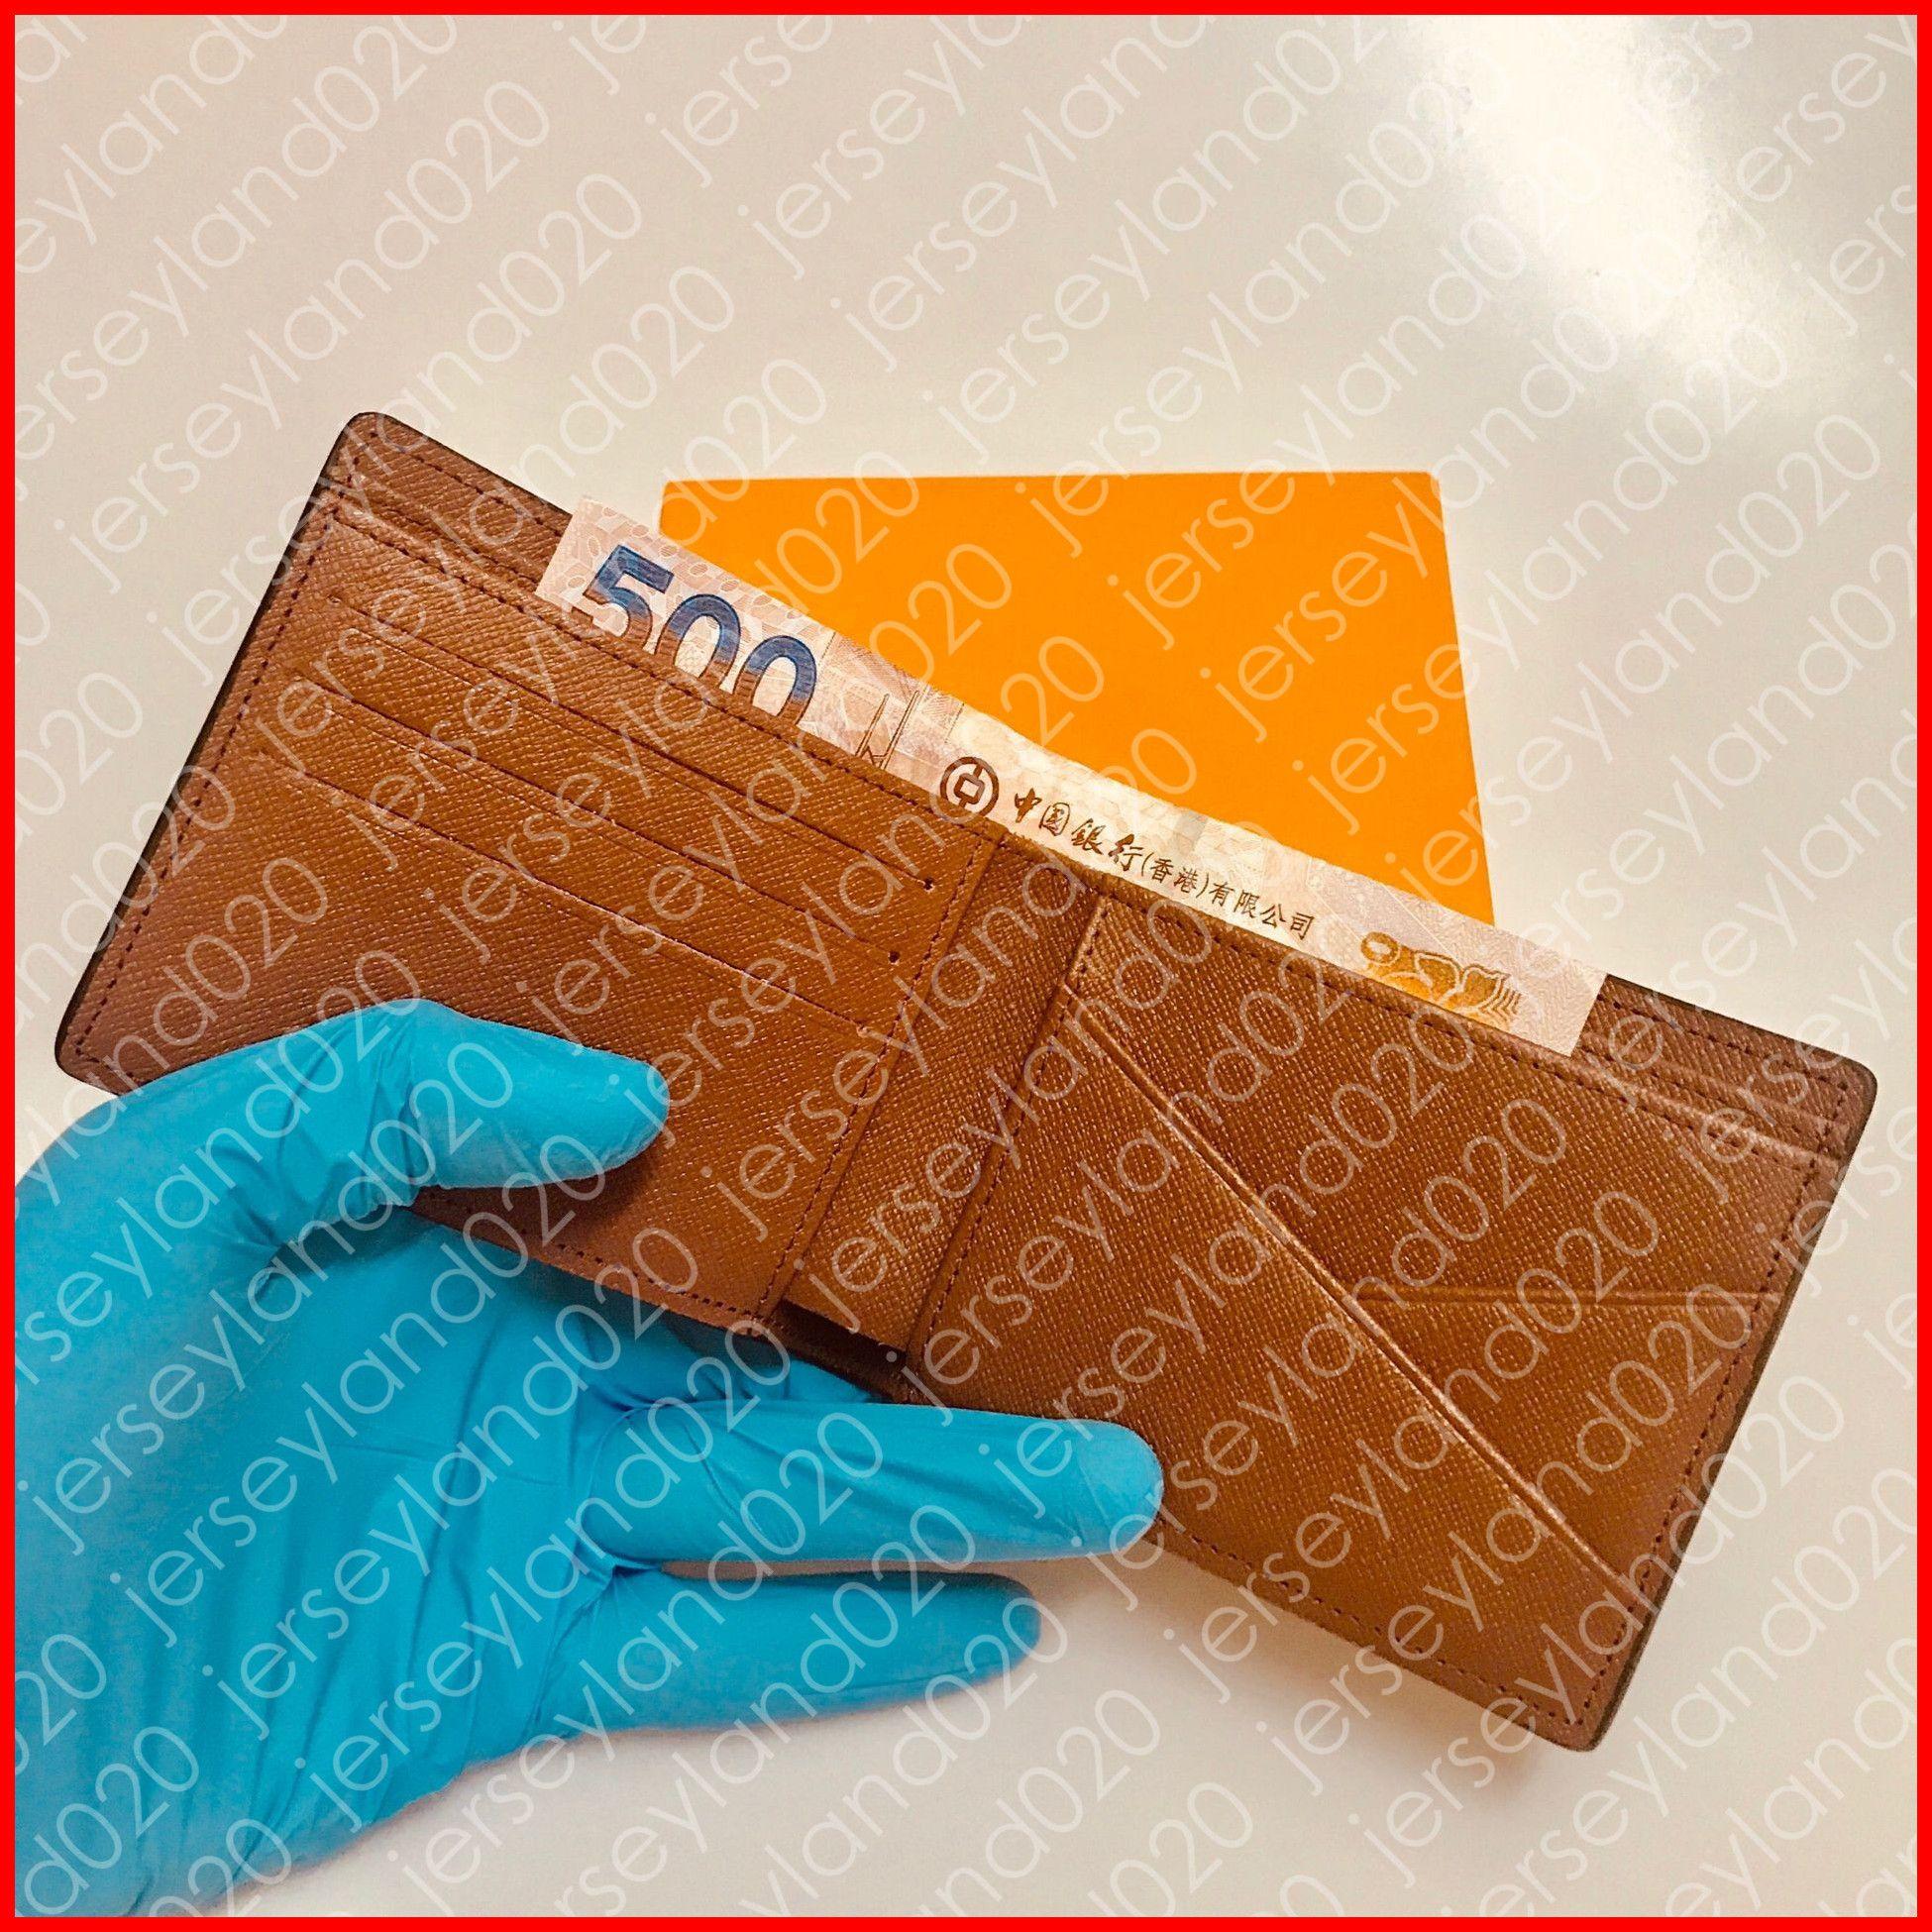 PORTAFOGLIO MULTIPLO M60895 Designer uomo Fashion Compact Short snello Portafoglio Luxury ID Card Holder Pocket Organizer Nero Damier Canvas N62663